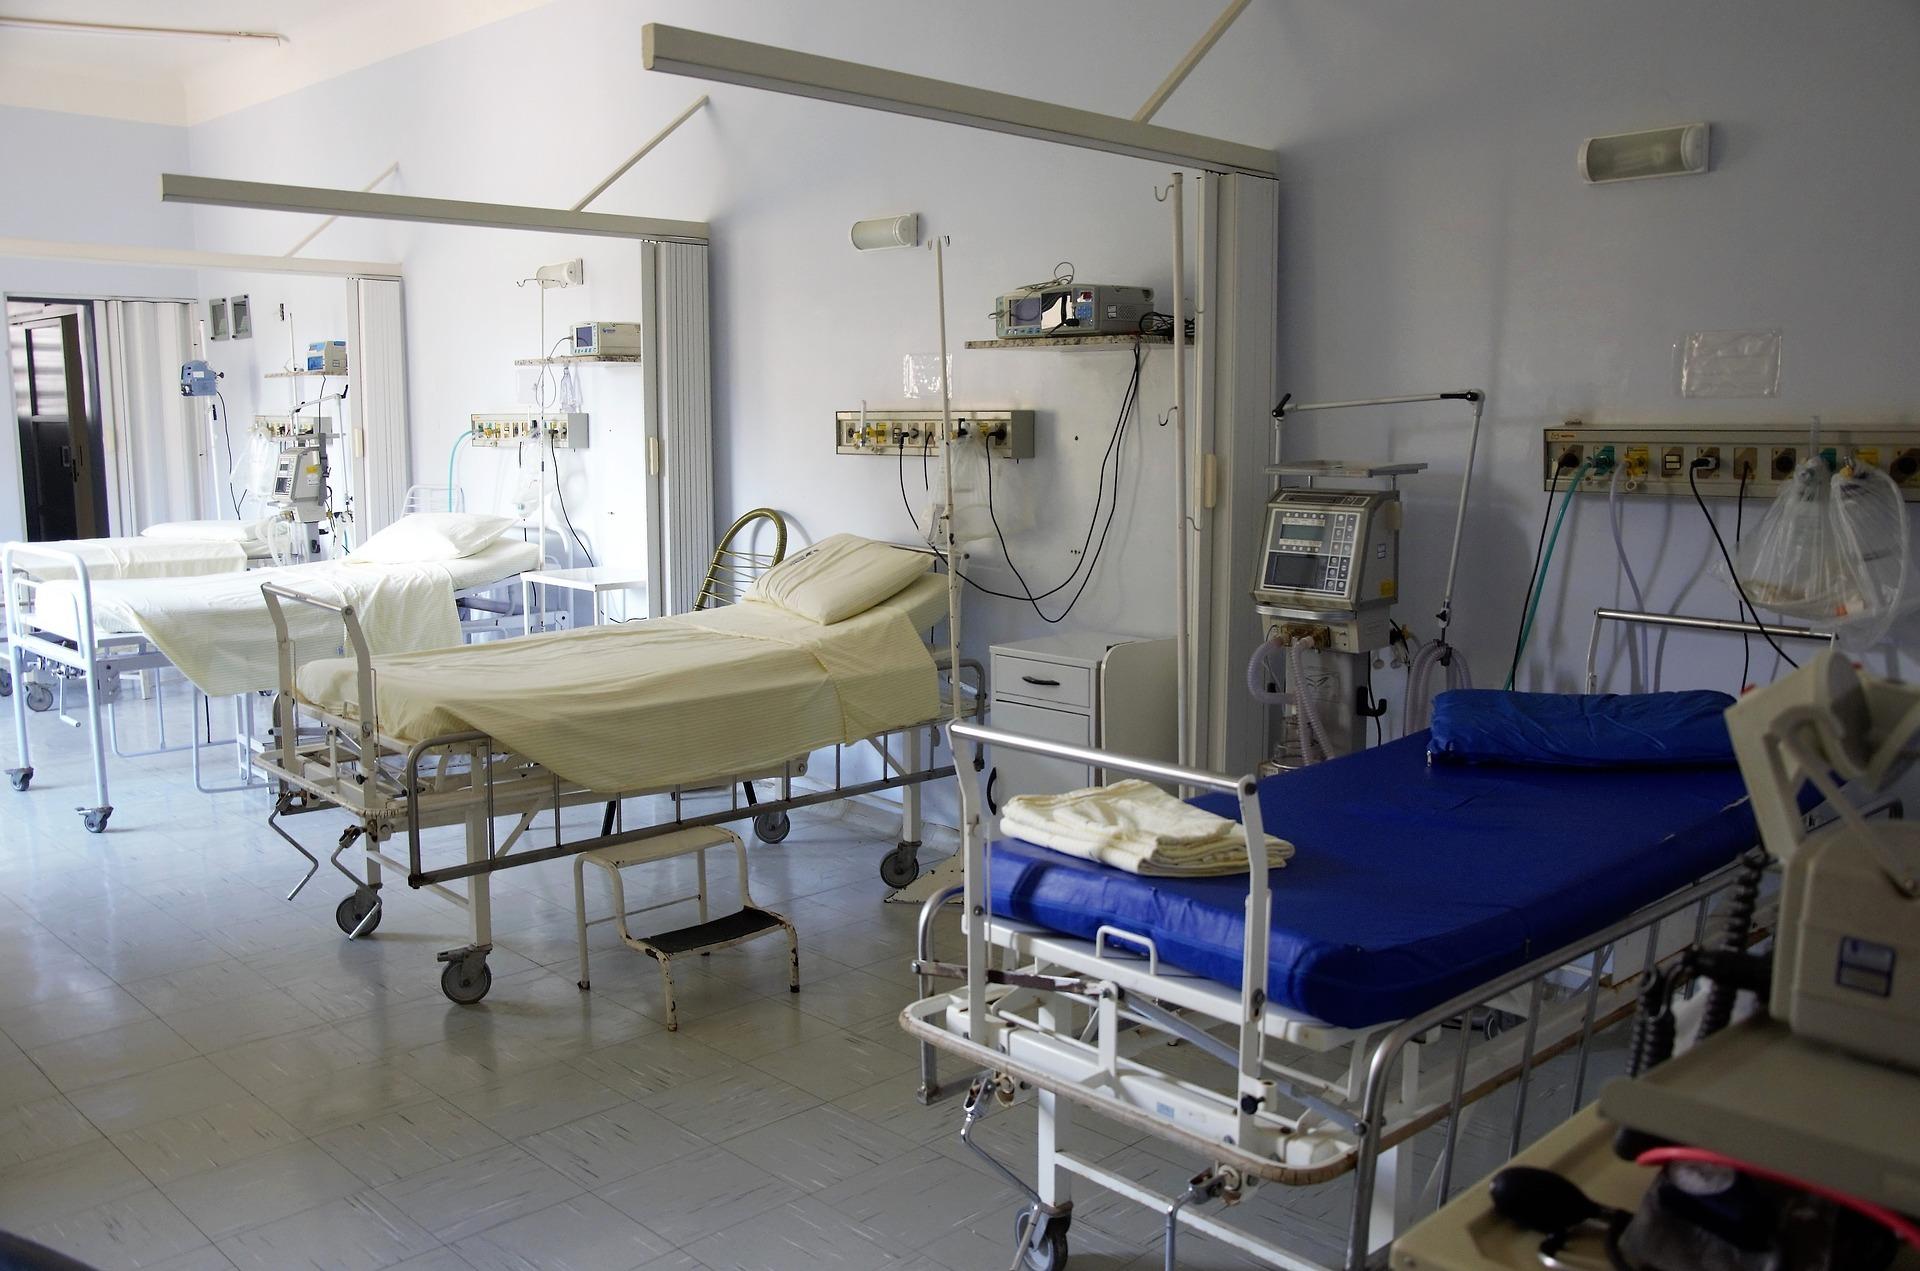 hospital-1802679_1920.jpg